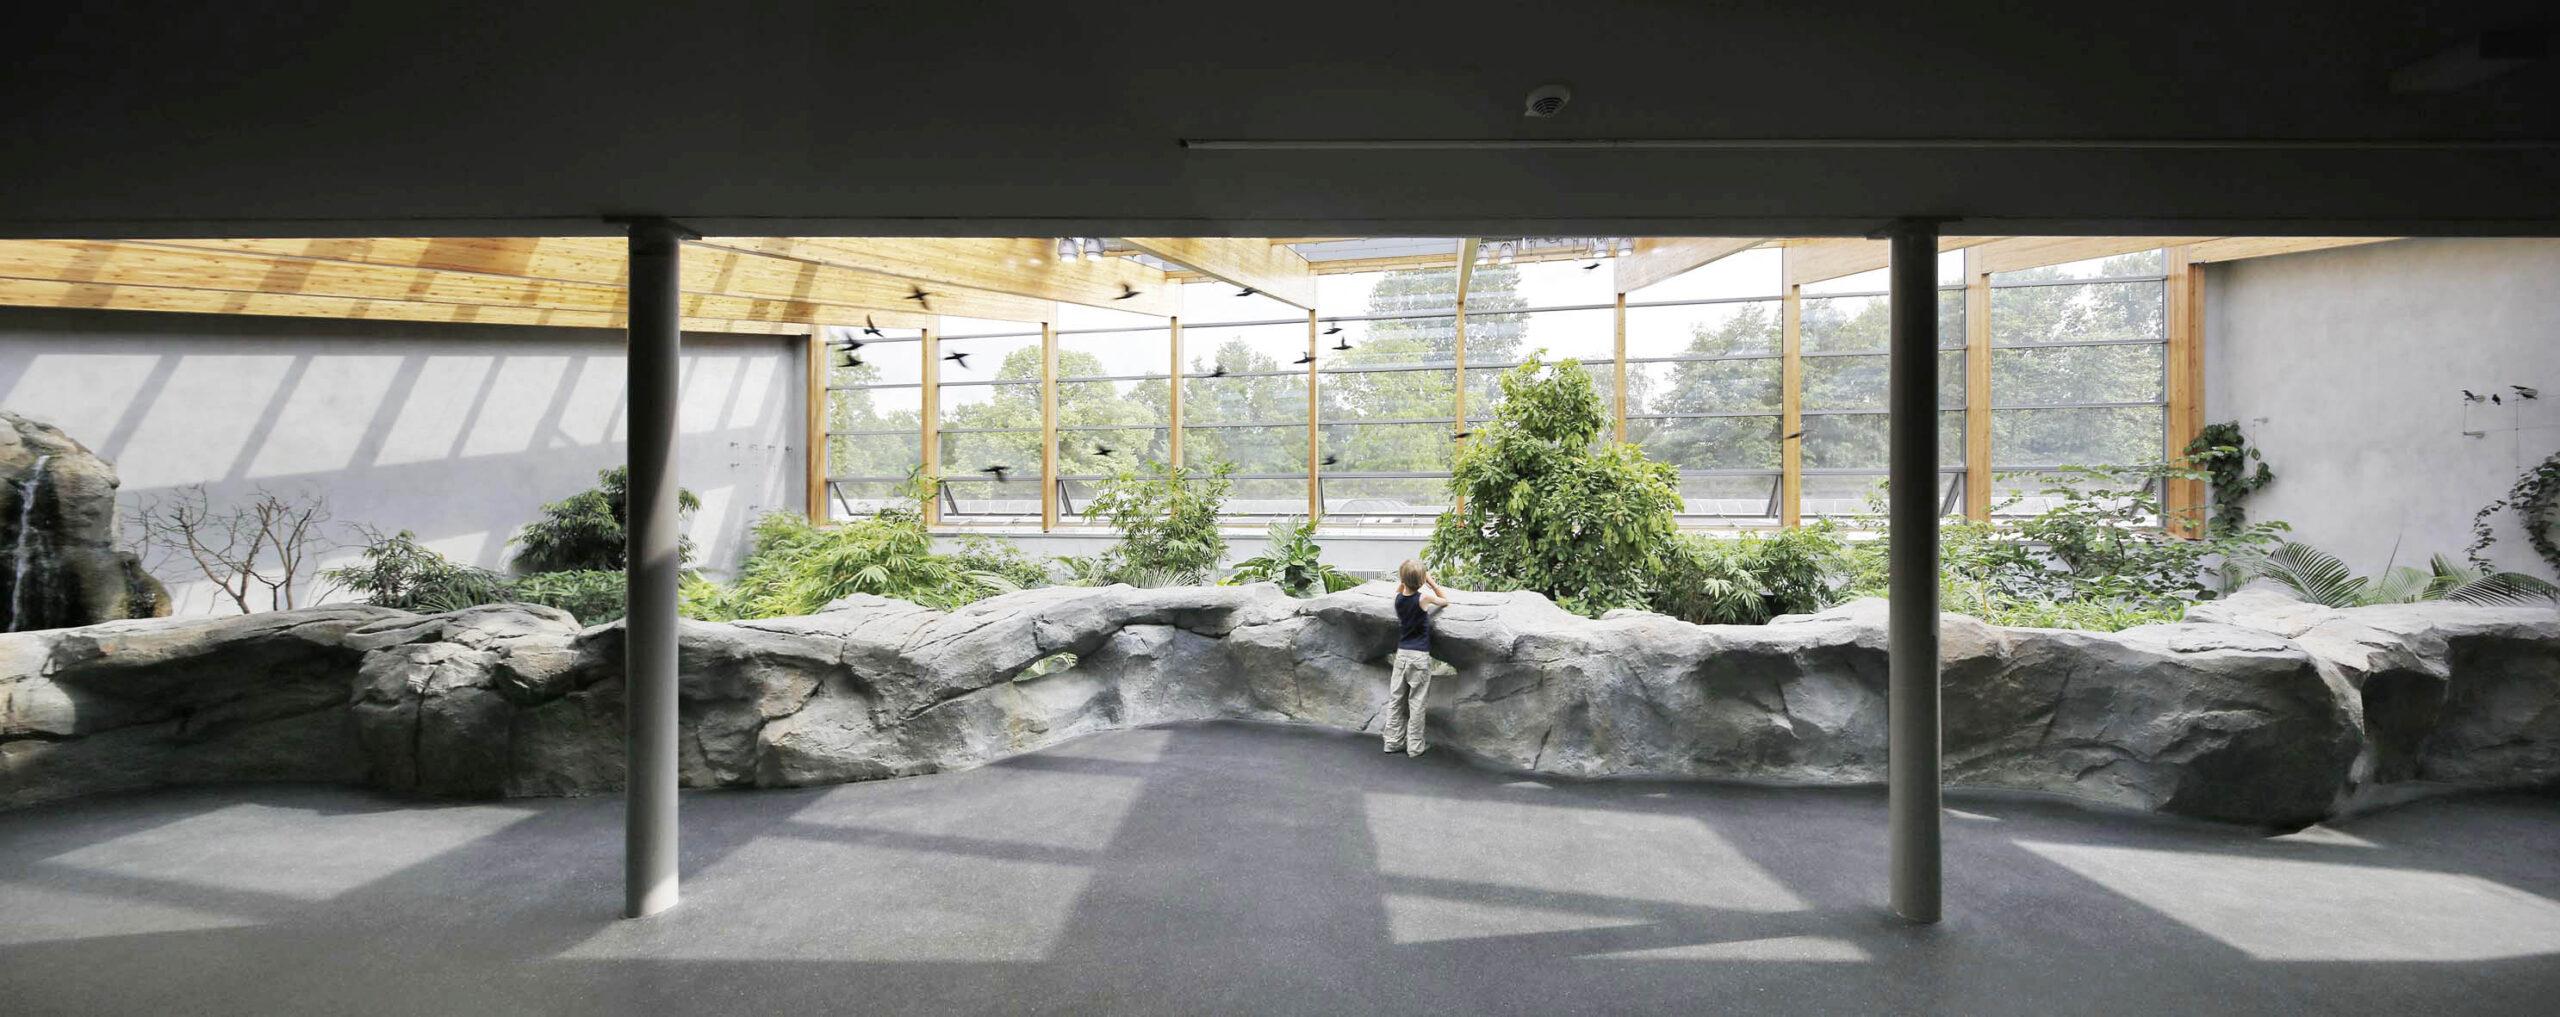 Panorama Galerie Freiflughallen